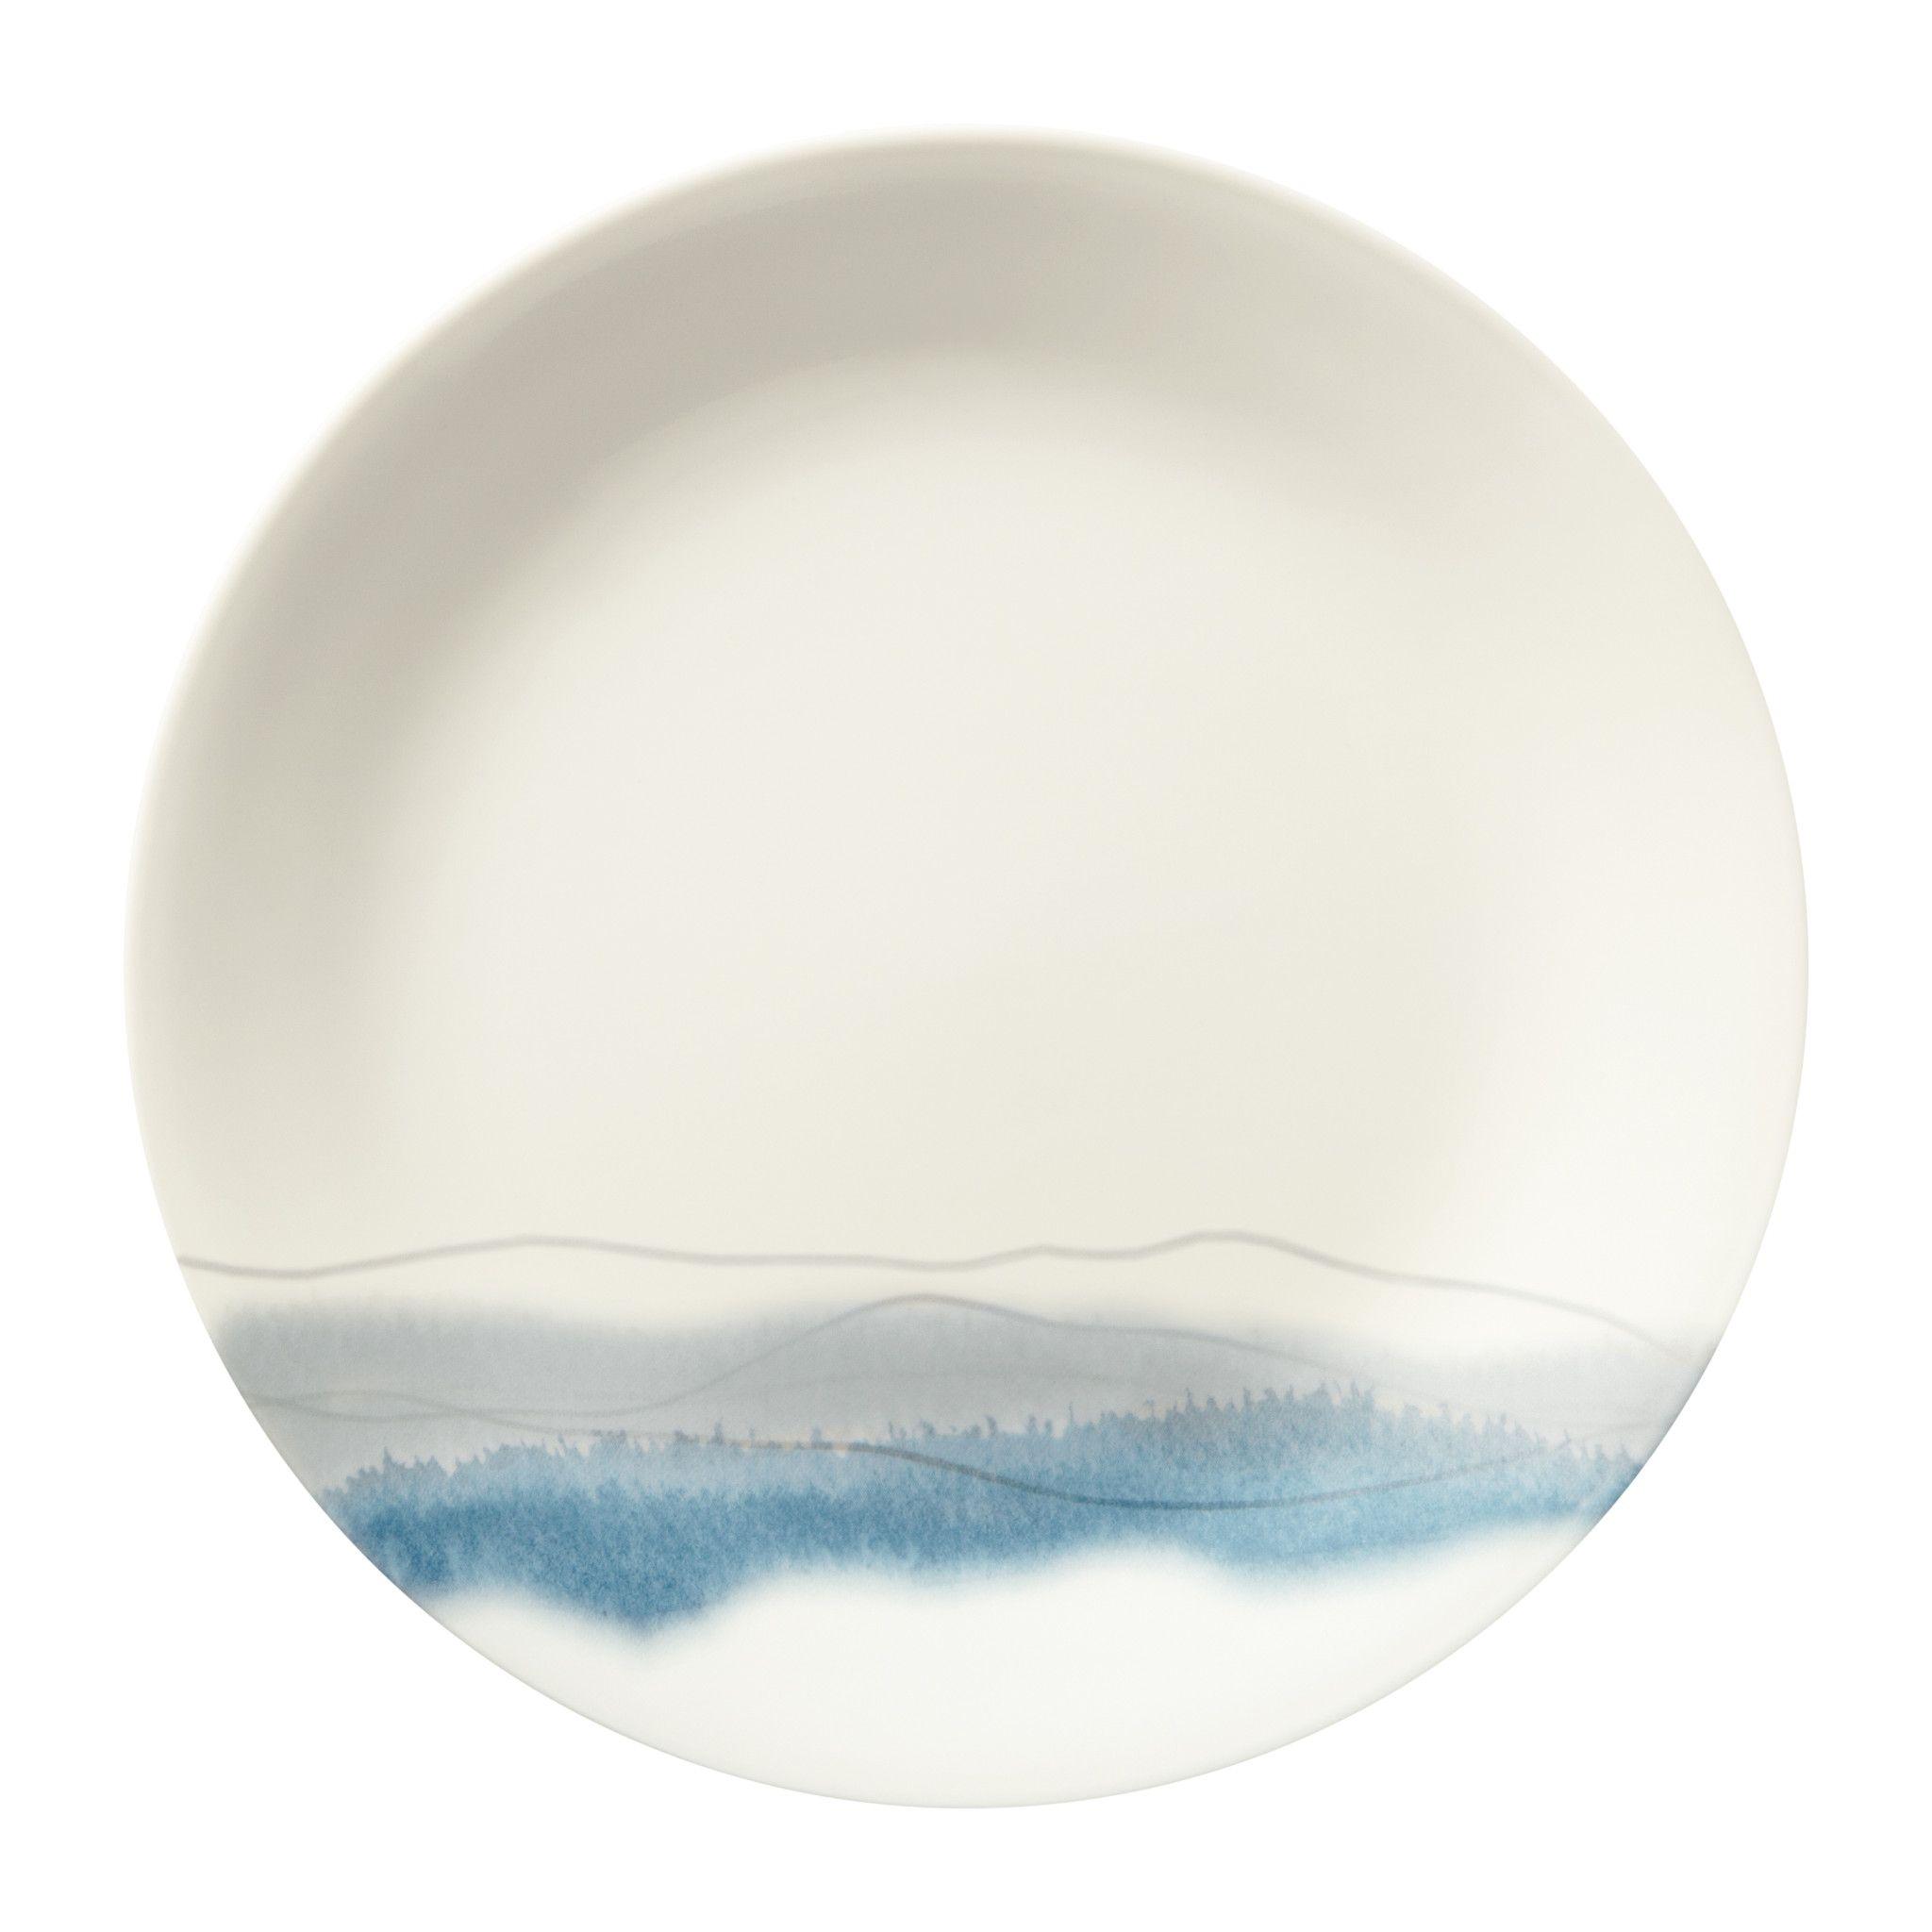 Corelle_Blue_Adirondack_85_Salad_Plate